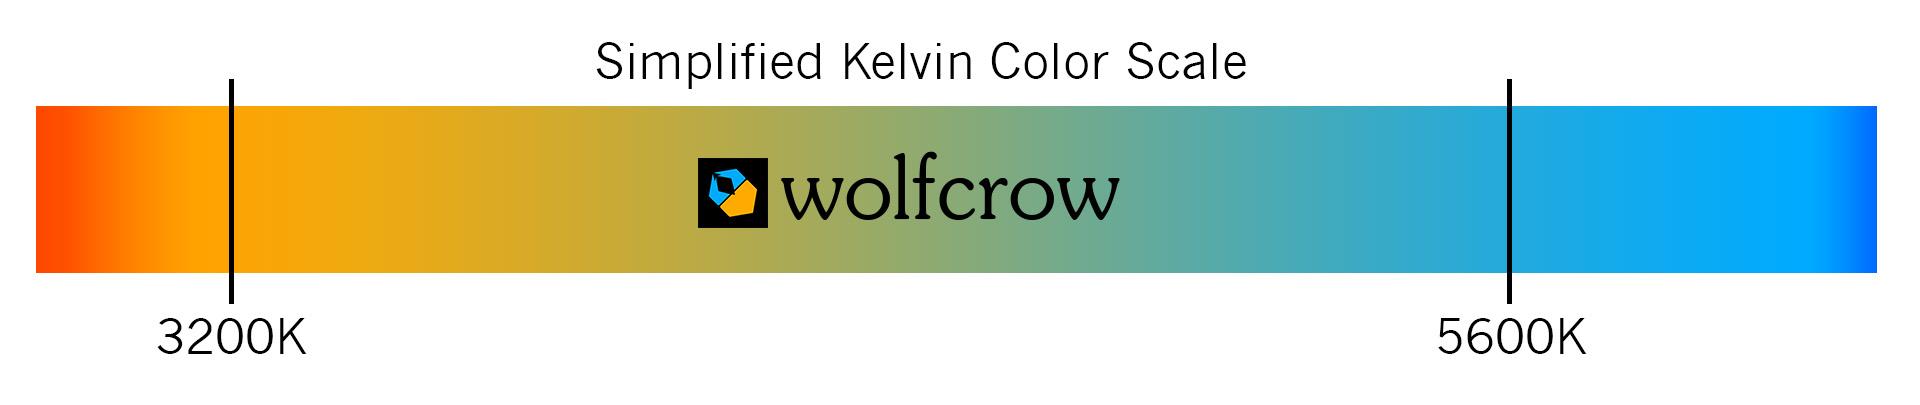 KelvinColorTemperatureScale